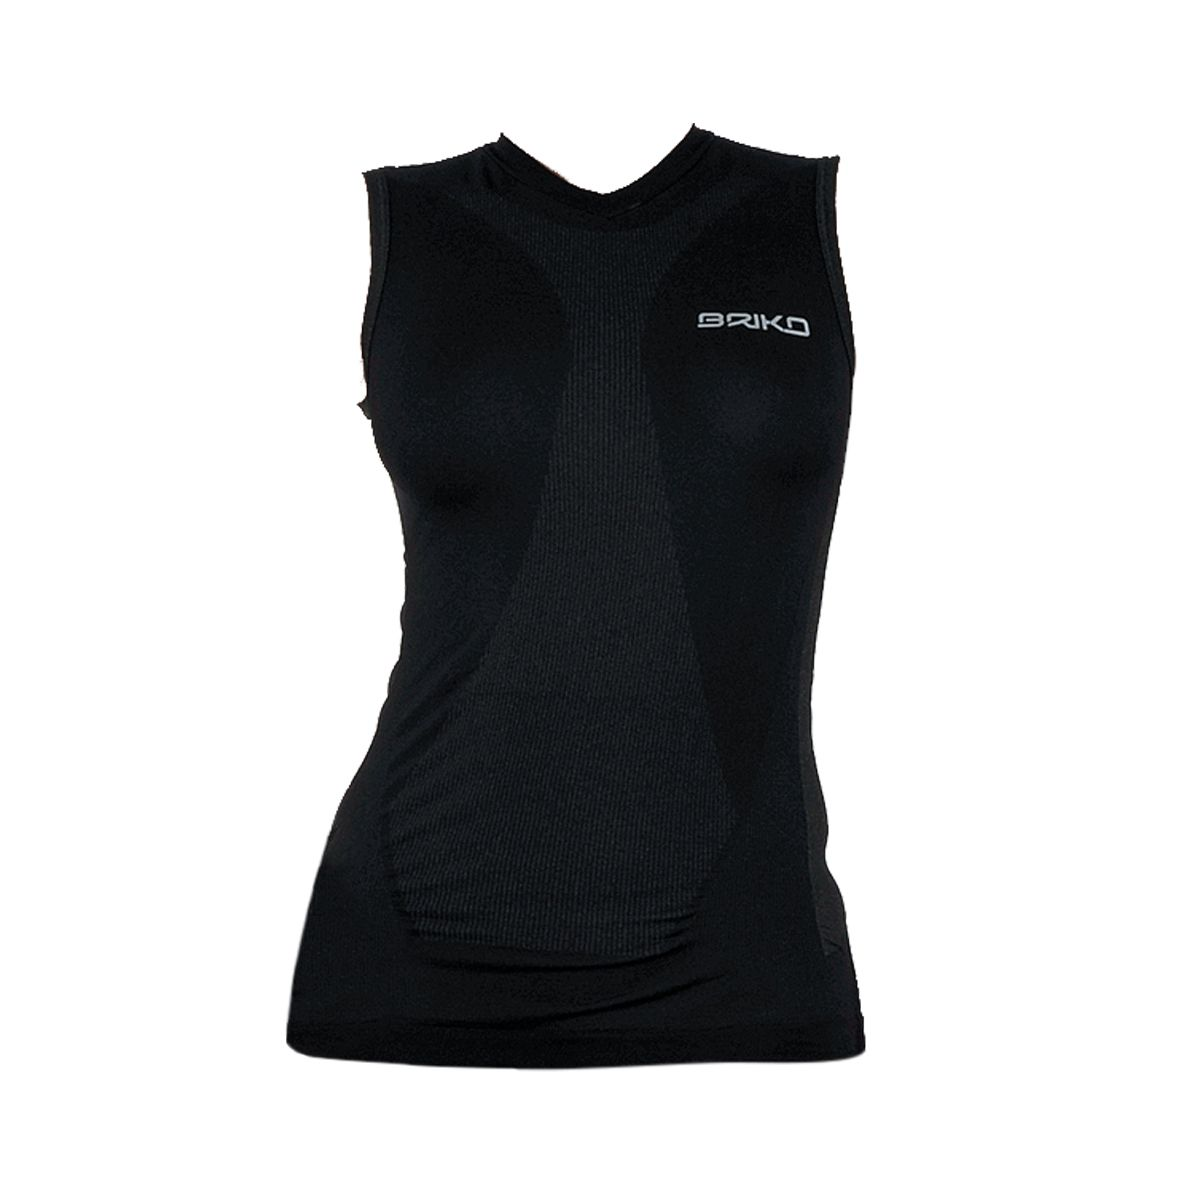 Briko T-shirt sportiva 100074 S.I.O. SINGLET LADY Camicia Donna